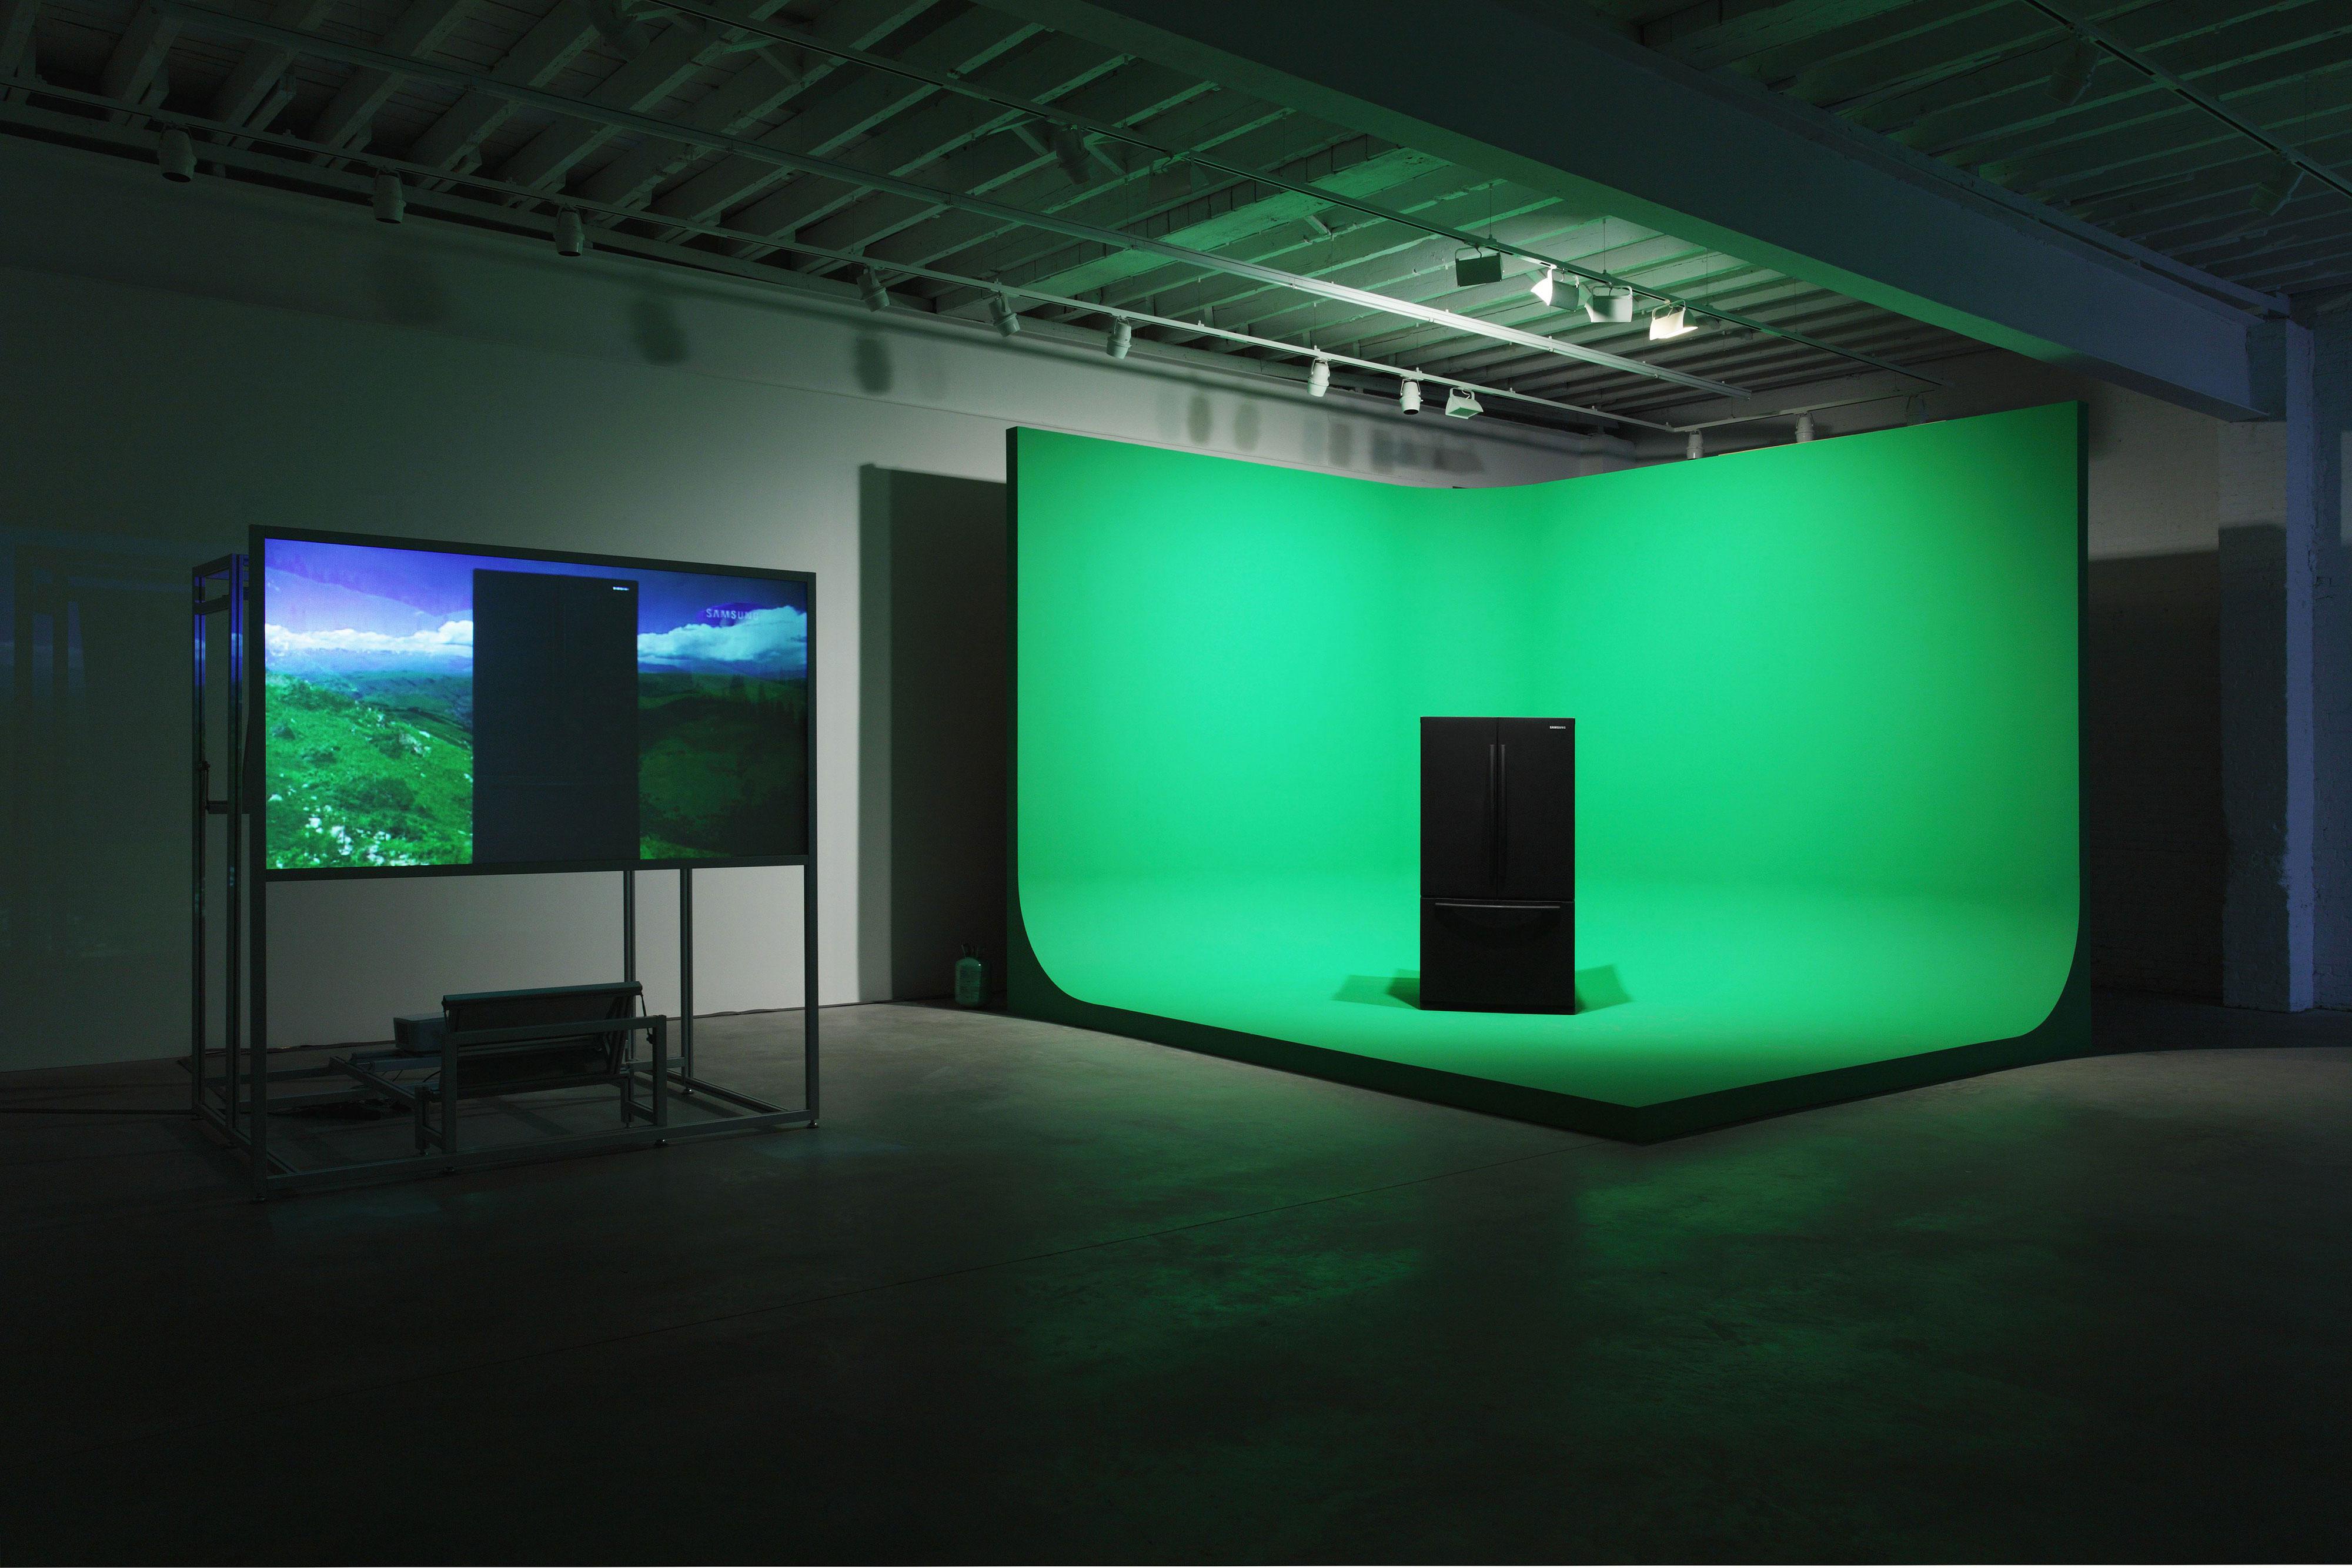 Green Screen Refrigerator Action - Greenscreen, Pylon - PH Amedeo Benestante